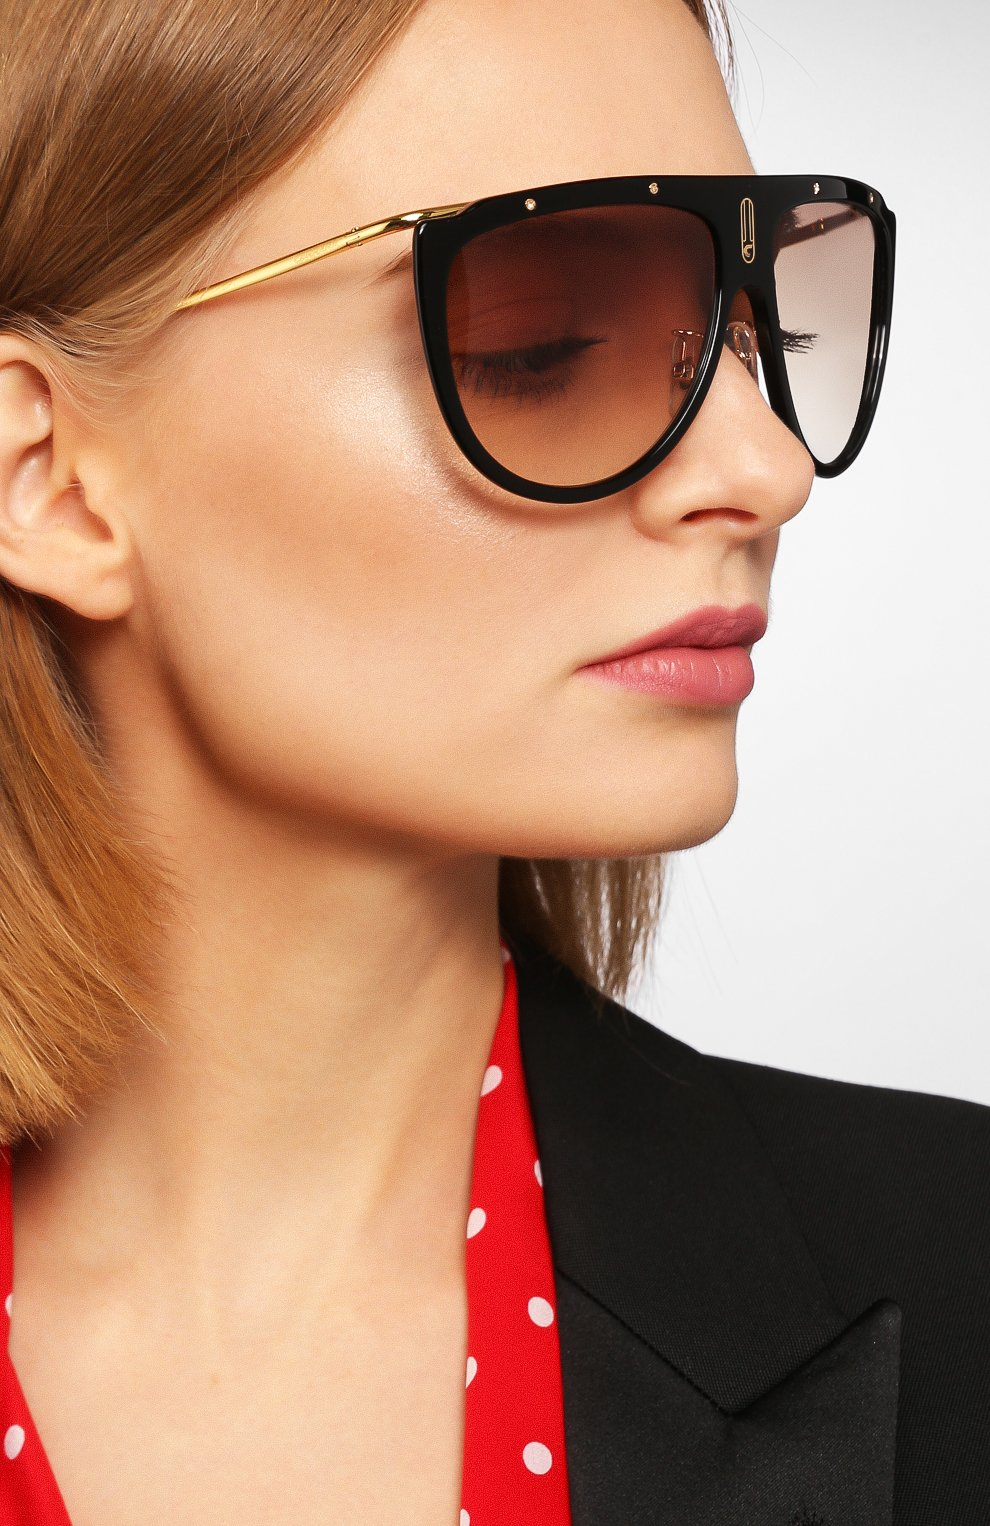 Женские солнцезащитные очки CARRERA коричневого цвета, арт. CARRERA 1023 2M2   Фото 2 (Тип очков: С/з; Статус проверки: Проверено, Проверена категория; Очки форма: Маска, D-форма; Оптика Гендер: оптика-унисекс)